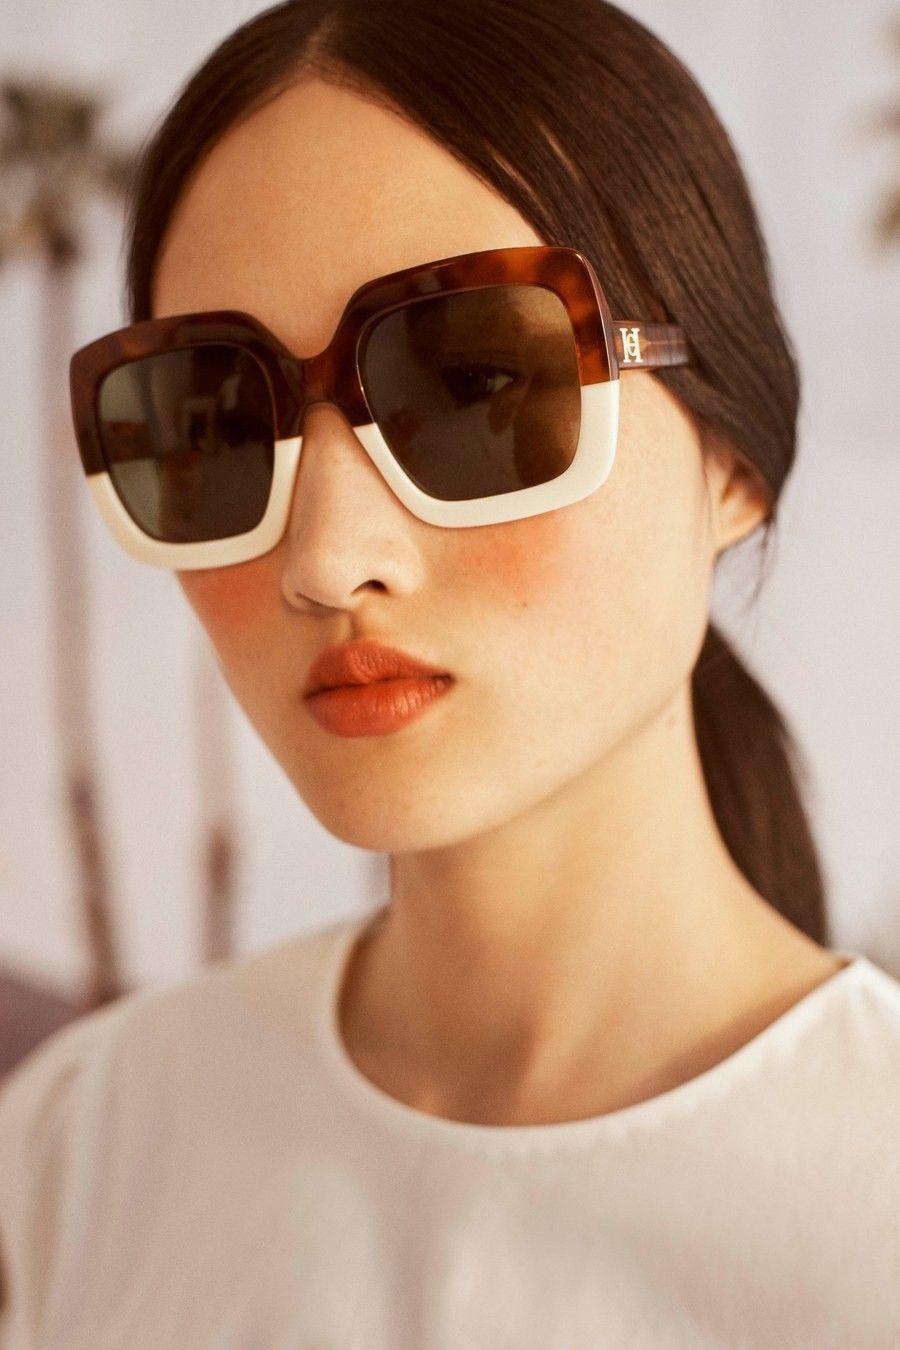 Resort En 2019 Herrera Show Fashion Carolina qMpSUVz